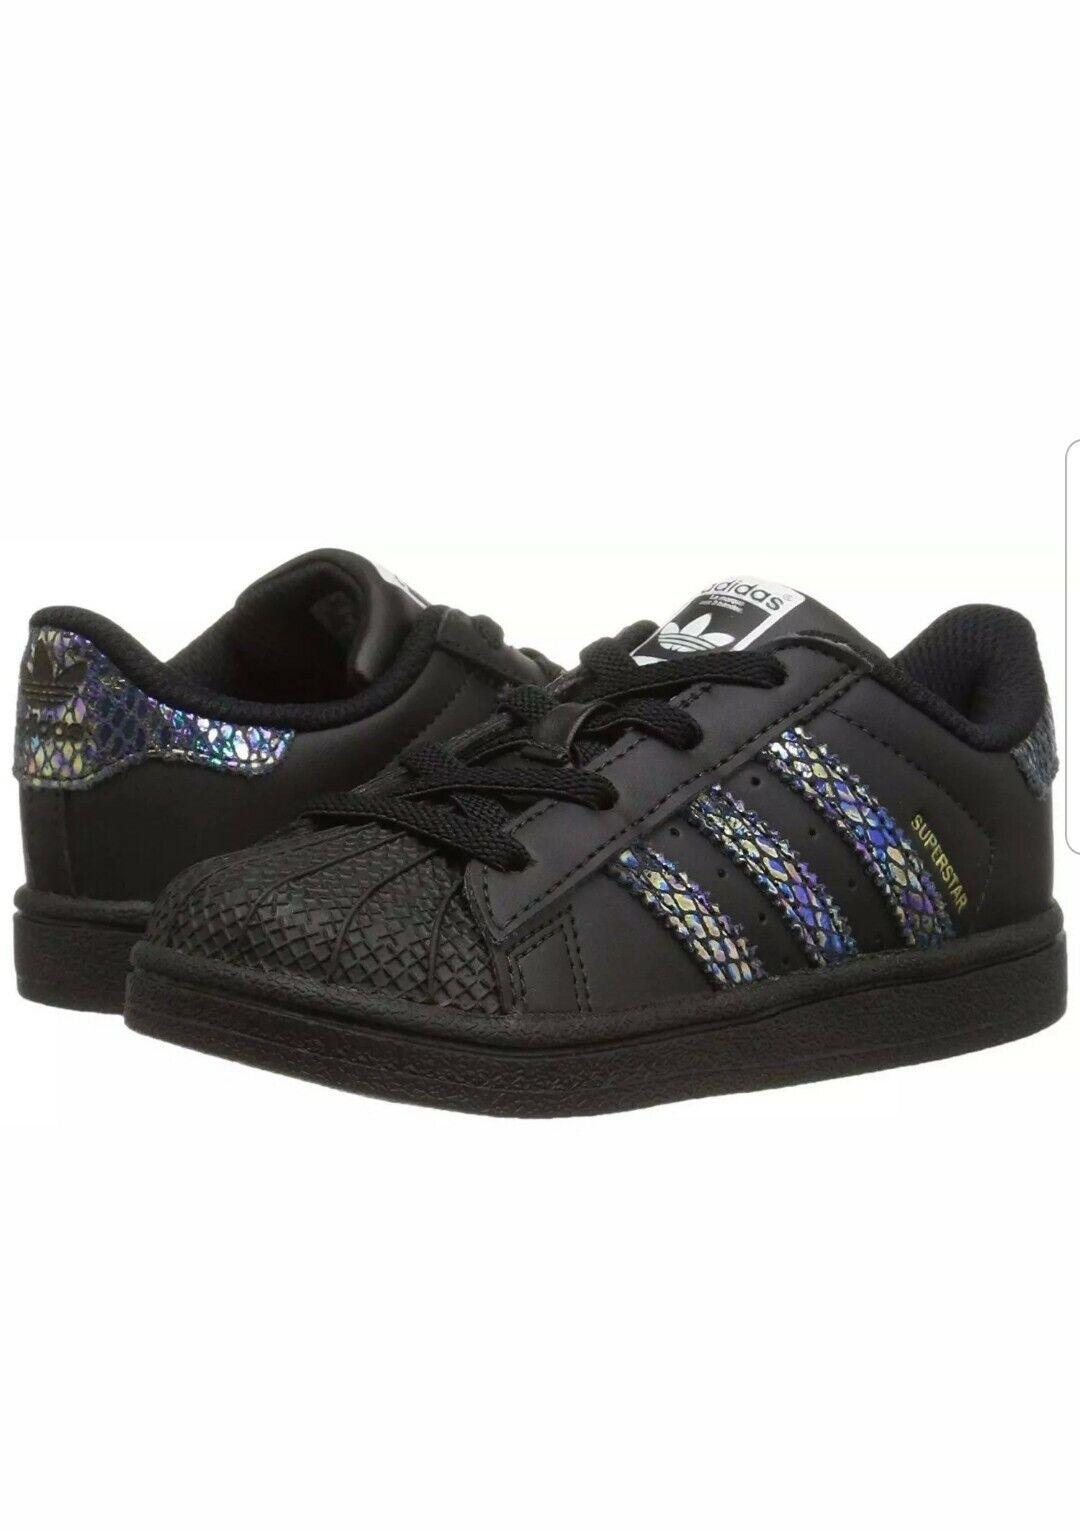 adidas Originals Baby Superstar EL I Black Rainbow Snake Size 4 M US Toddler